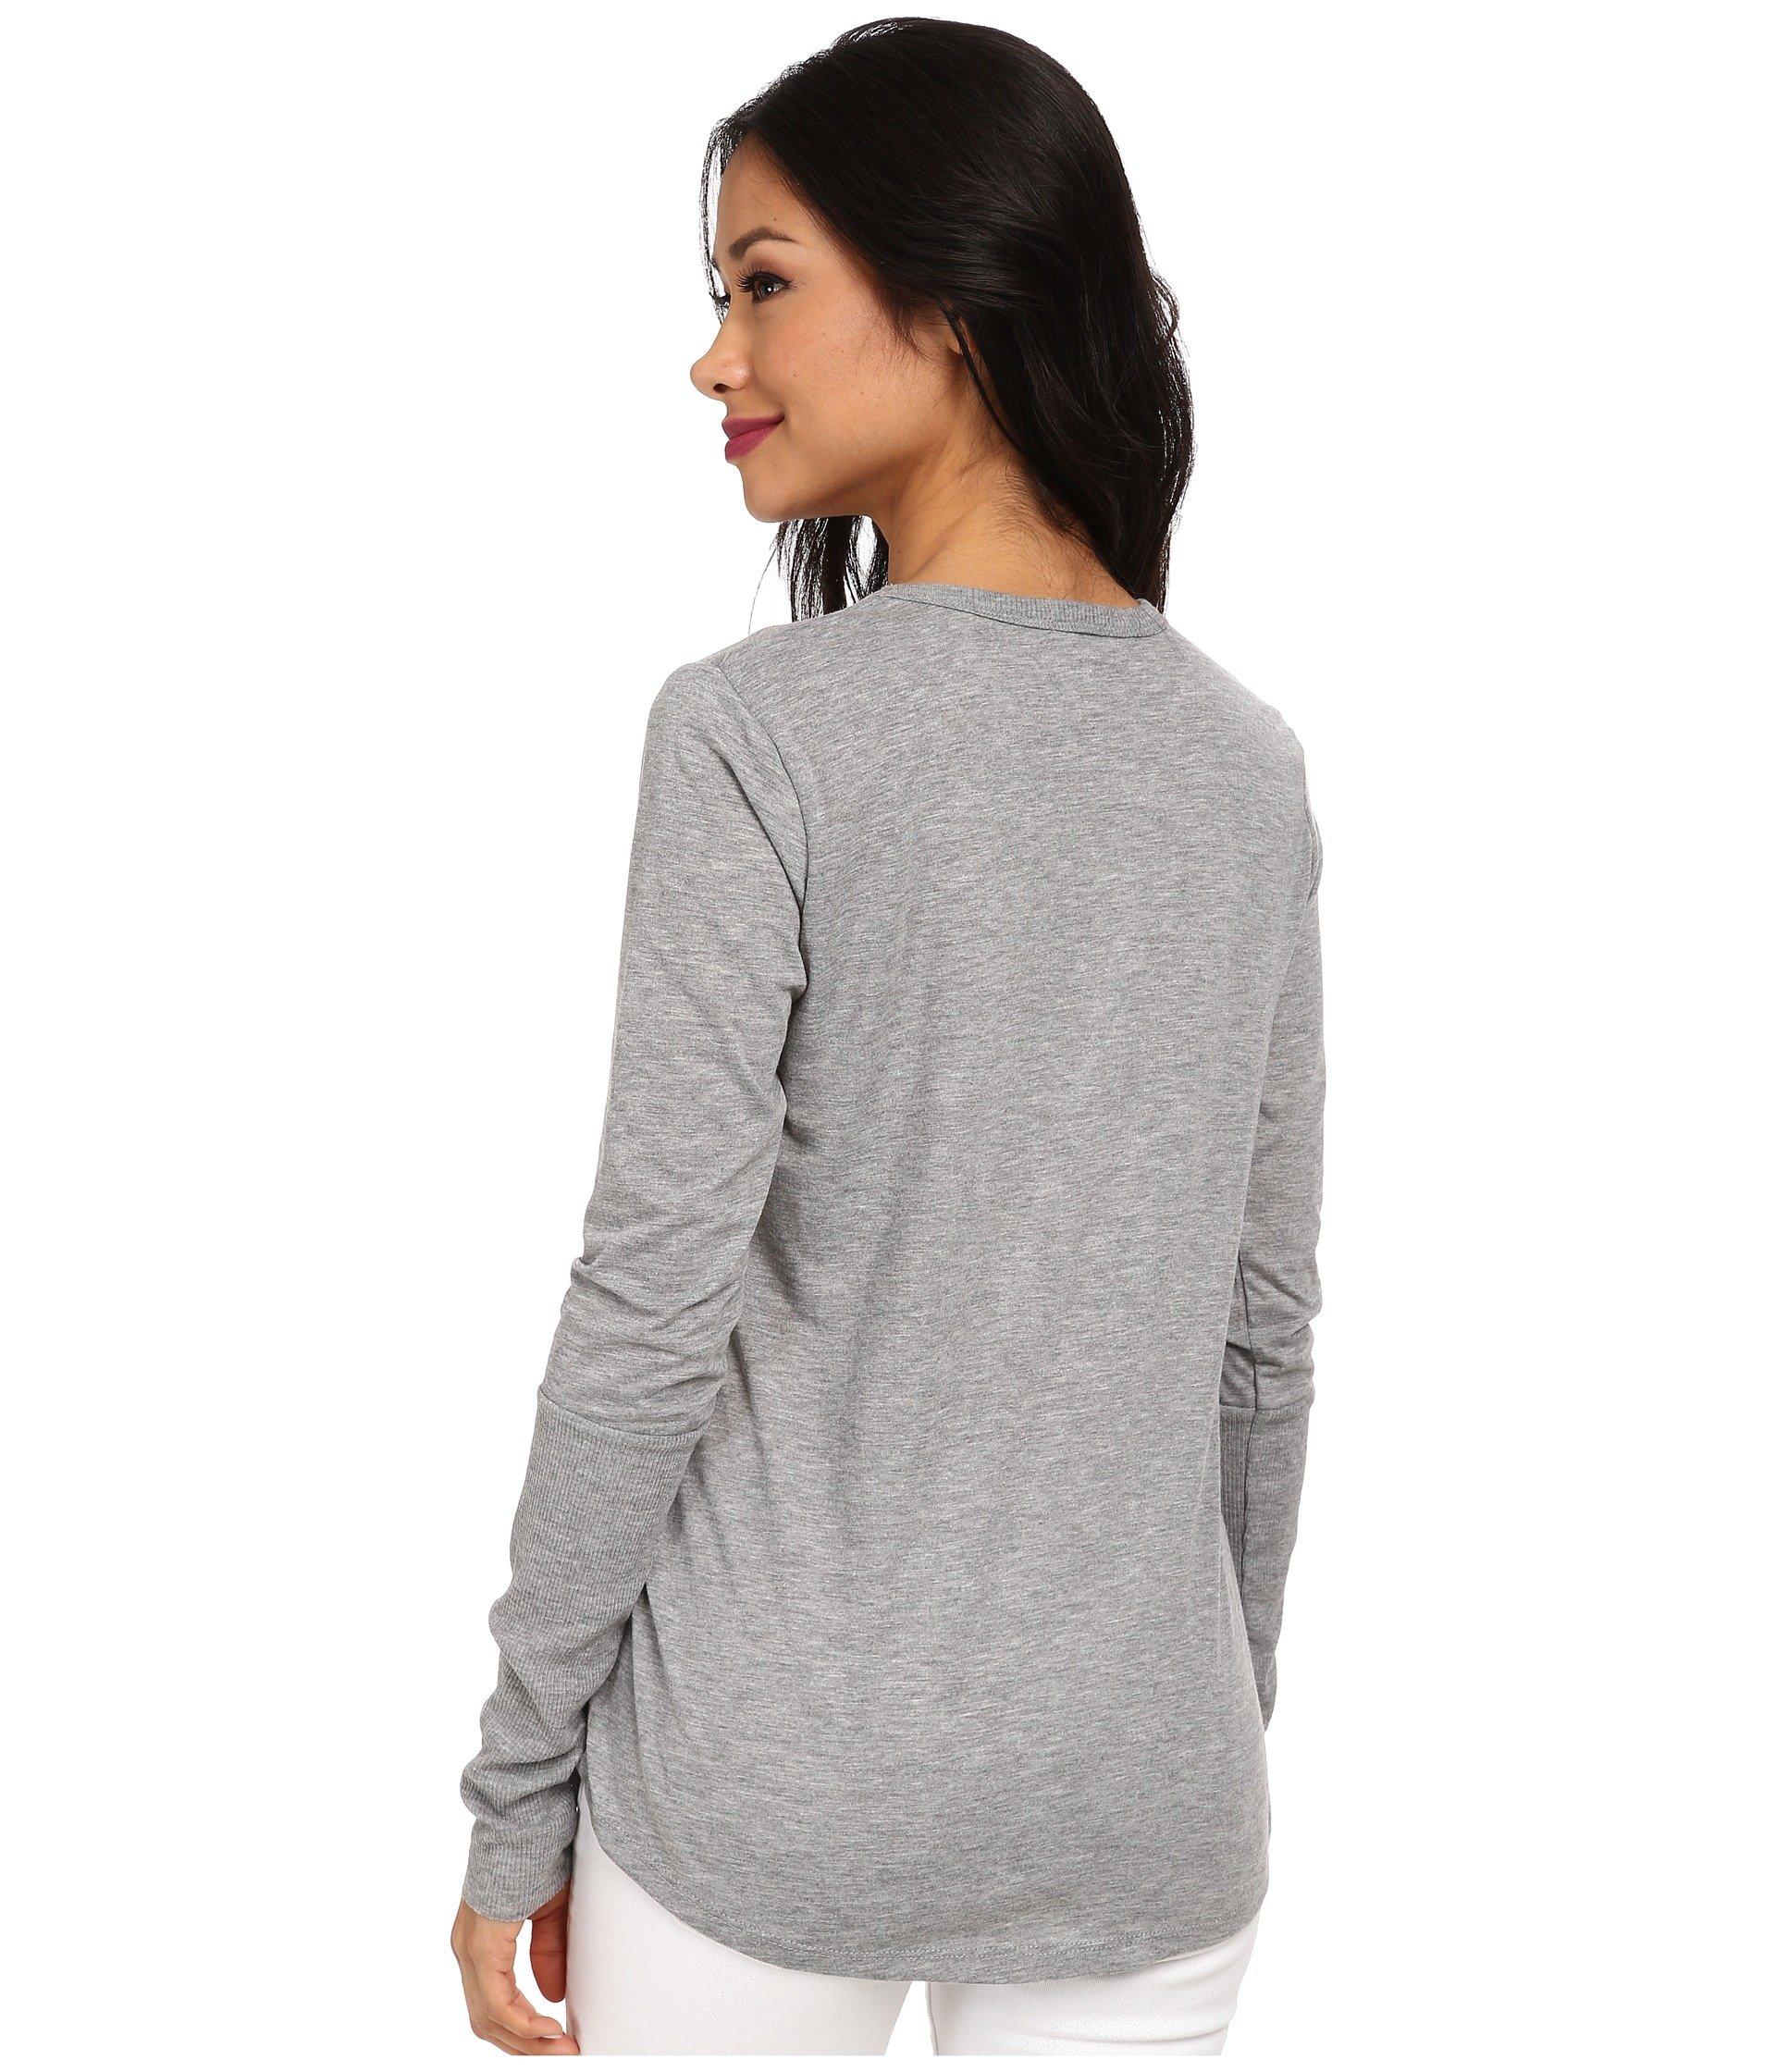 Alternative scoop neck t shirt long sleeve heather grey for Long sleeve scoop neck shirt